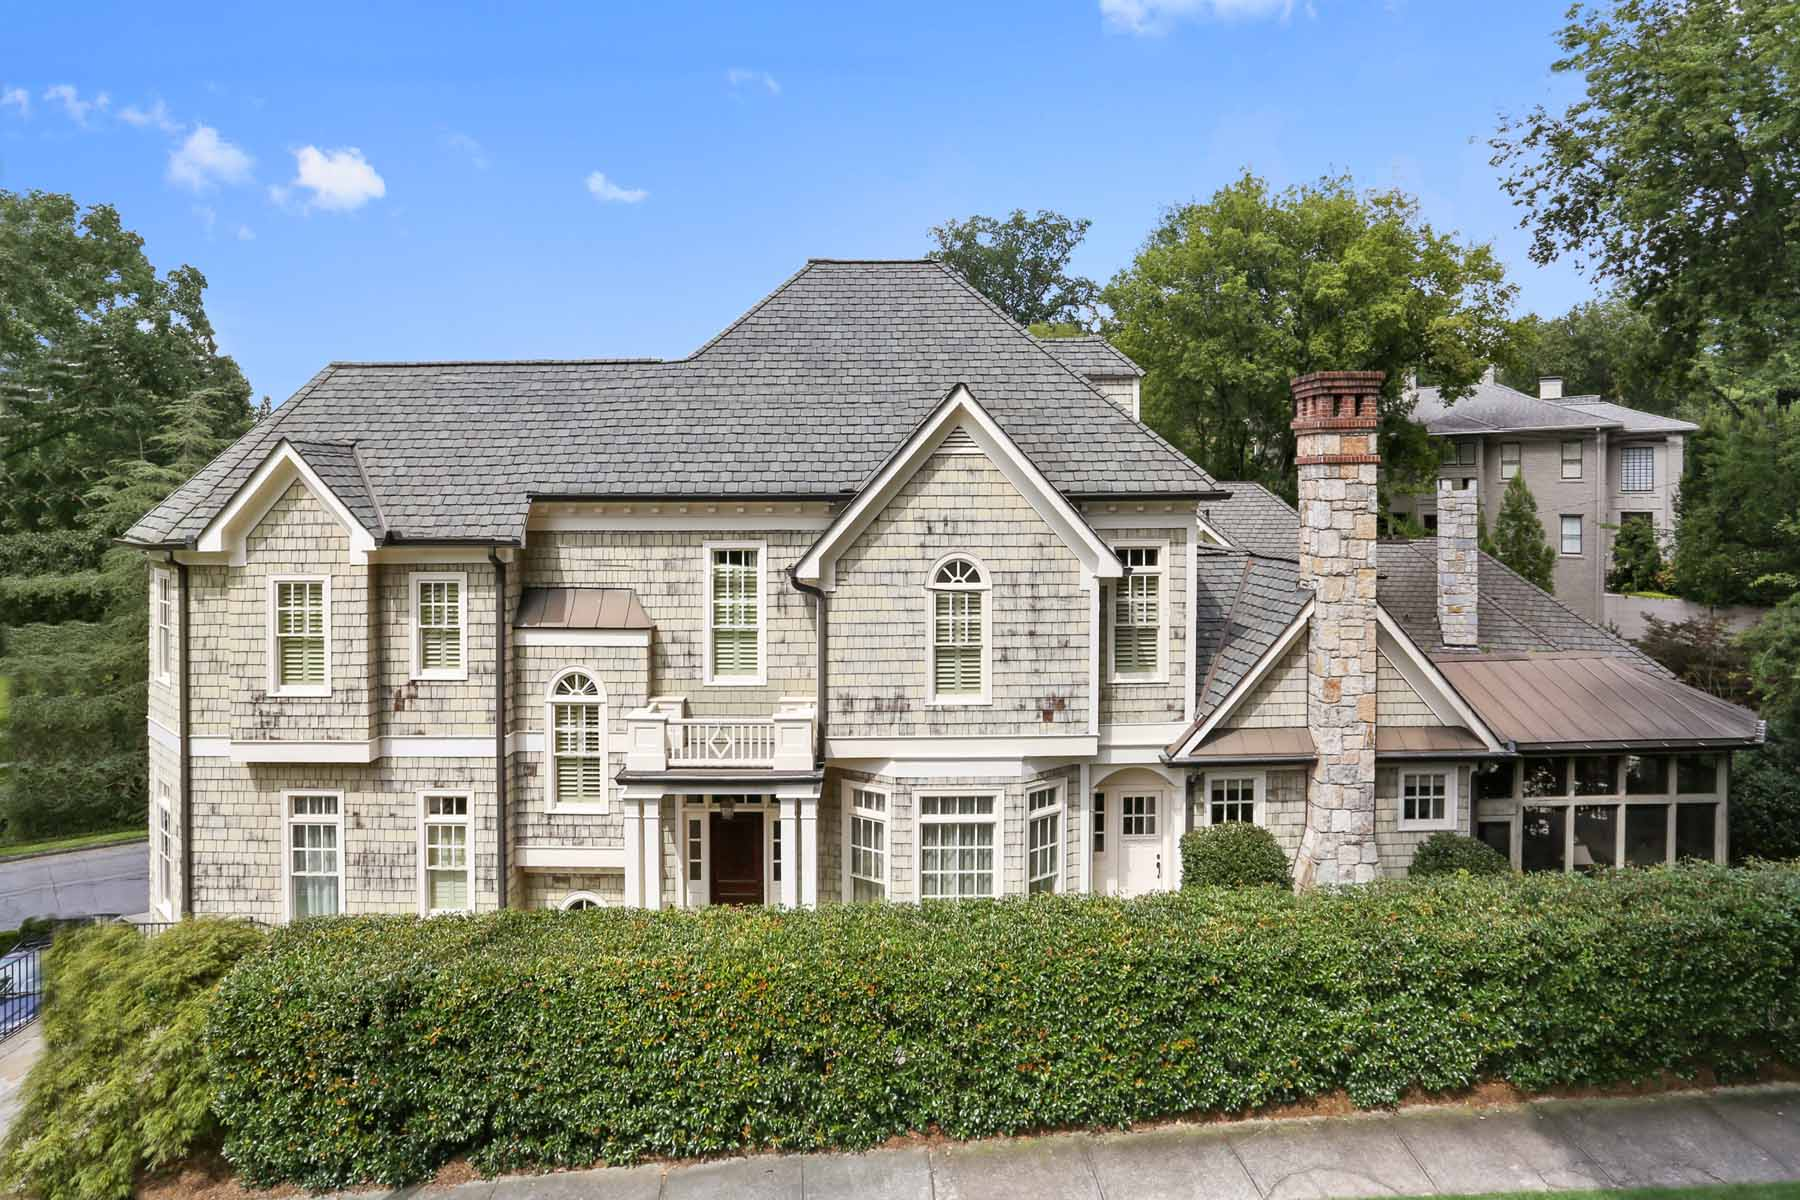 獨棟家庭住宅 為 出售 在 Ansley Park Home Overlooking Winn Park 100 Lafayette Drive NE Ansley Park, Atlanta, 喬治亞州, 30309 美國